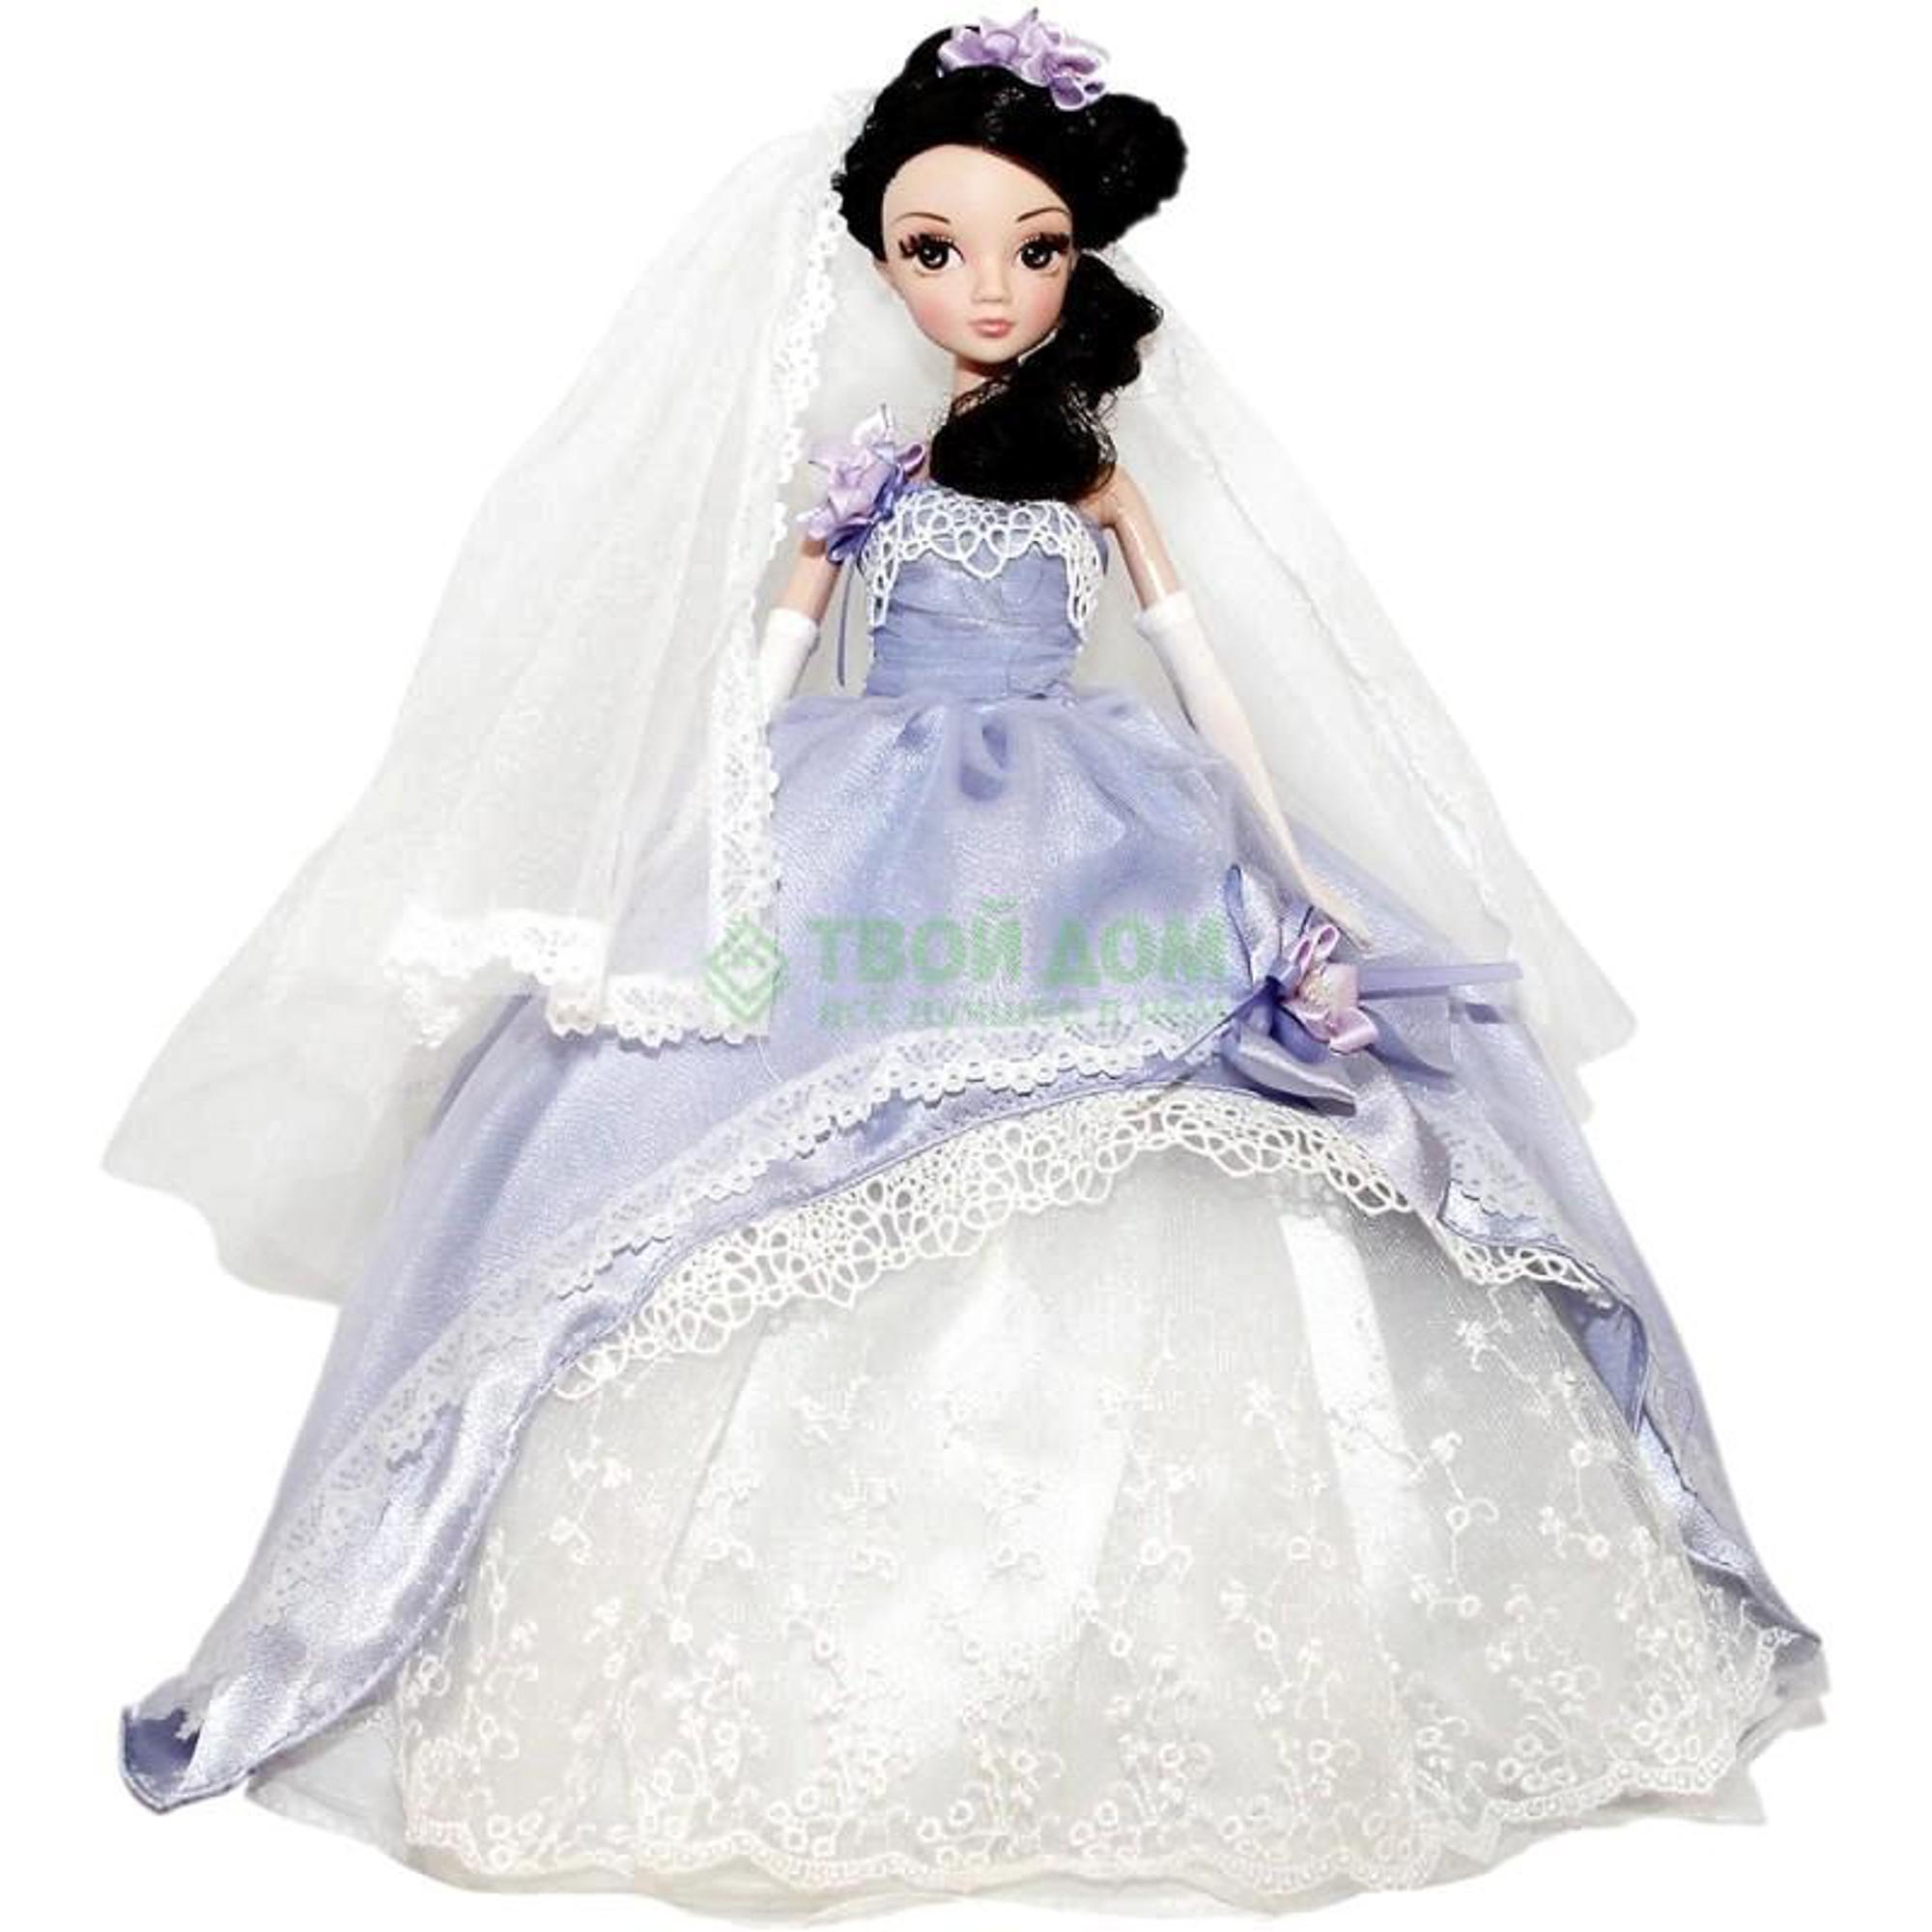 Кукла Sonya Золотая коллекция Нежная Сирень (R9084N) фото